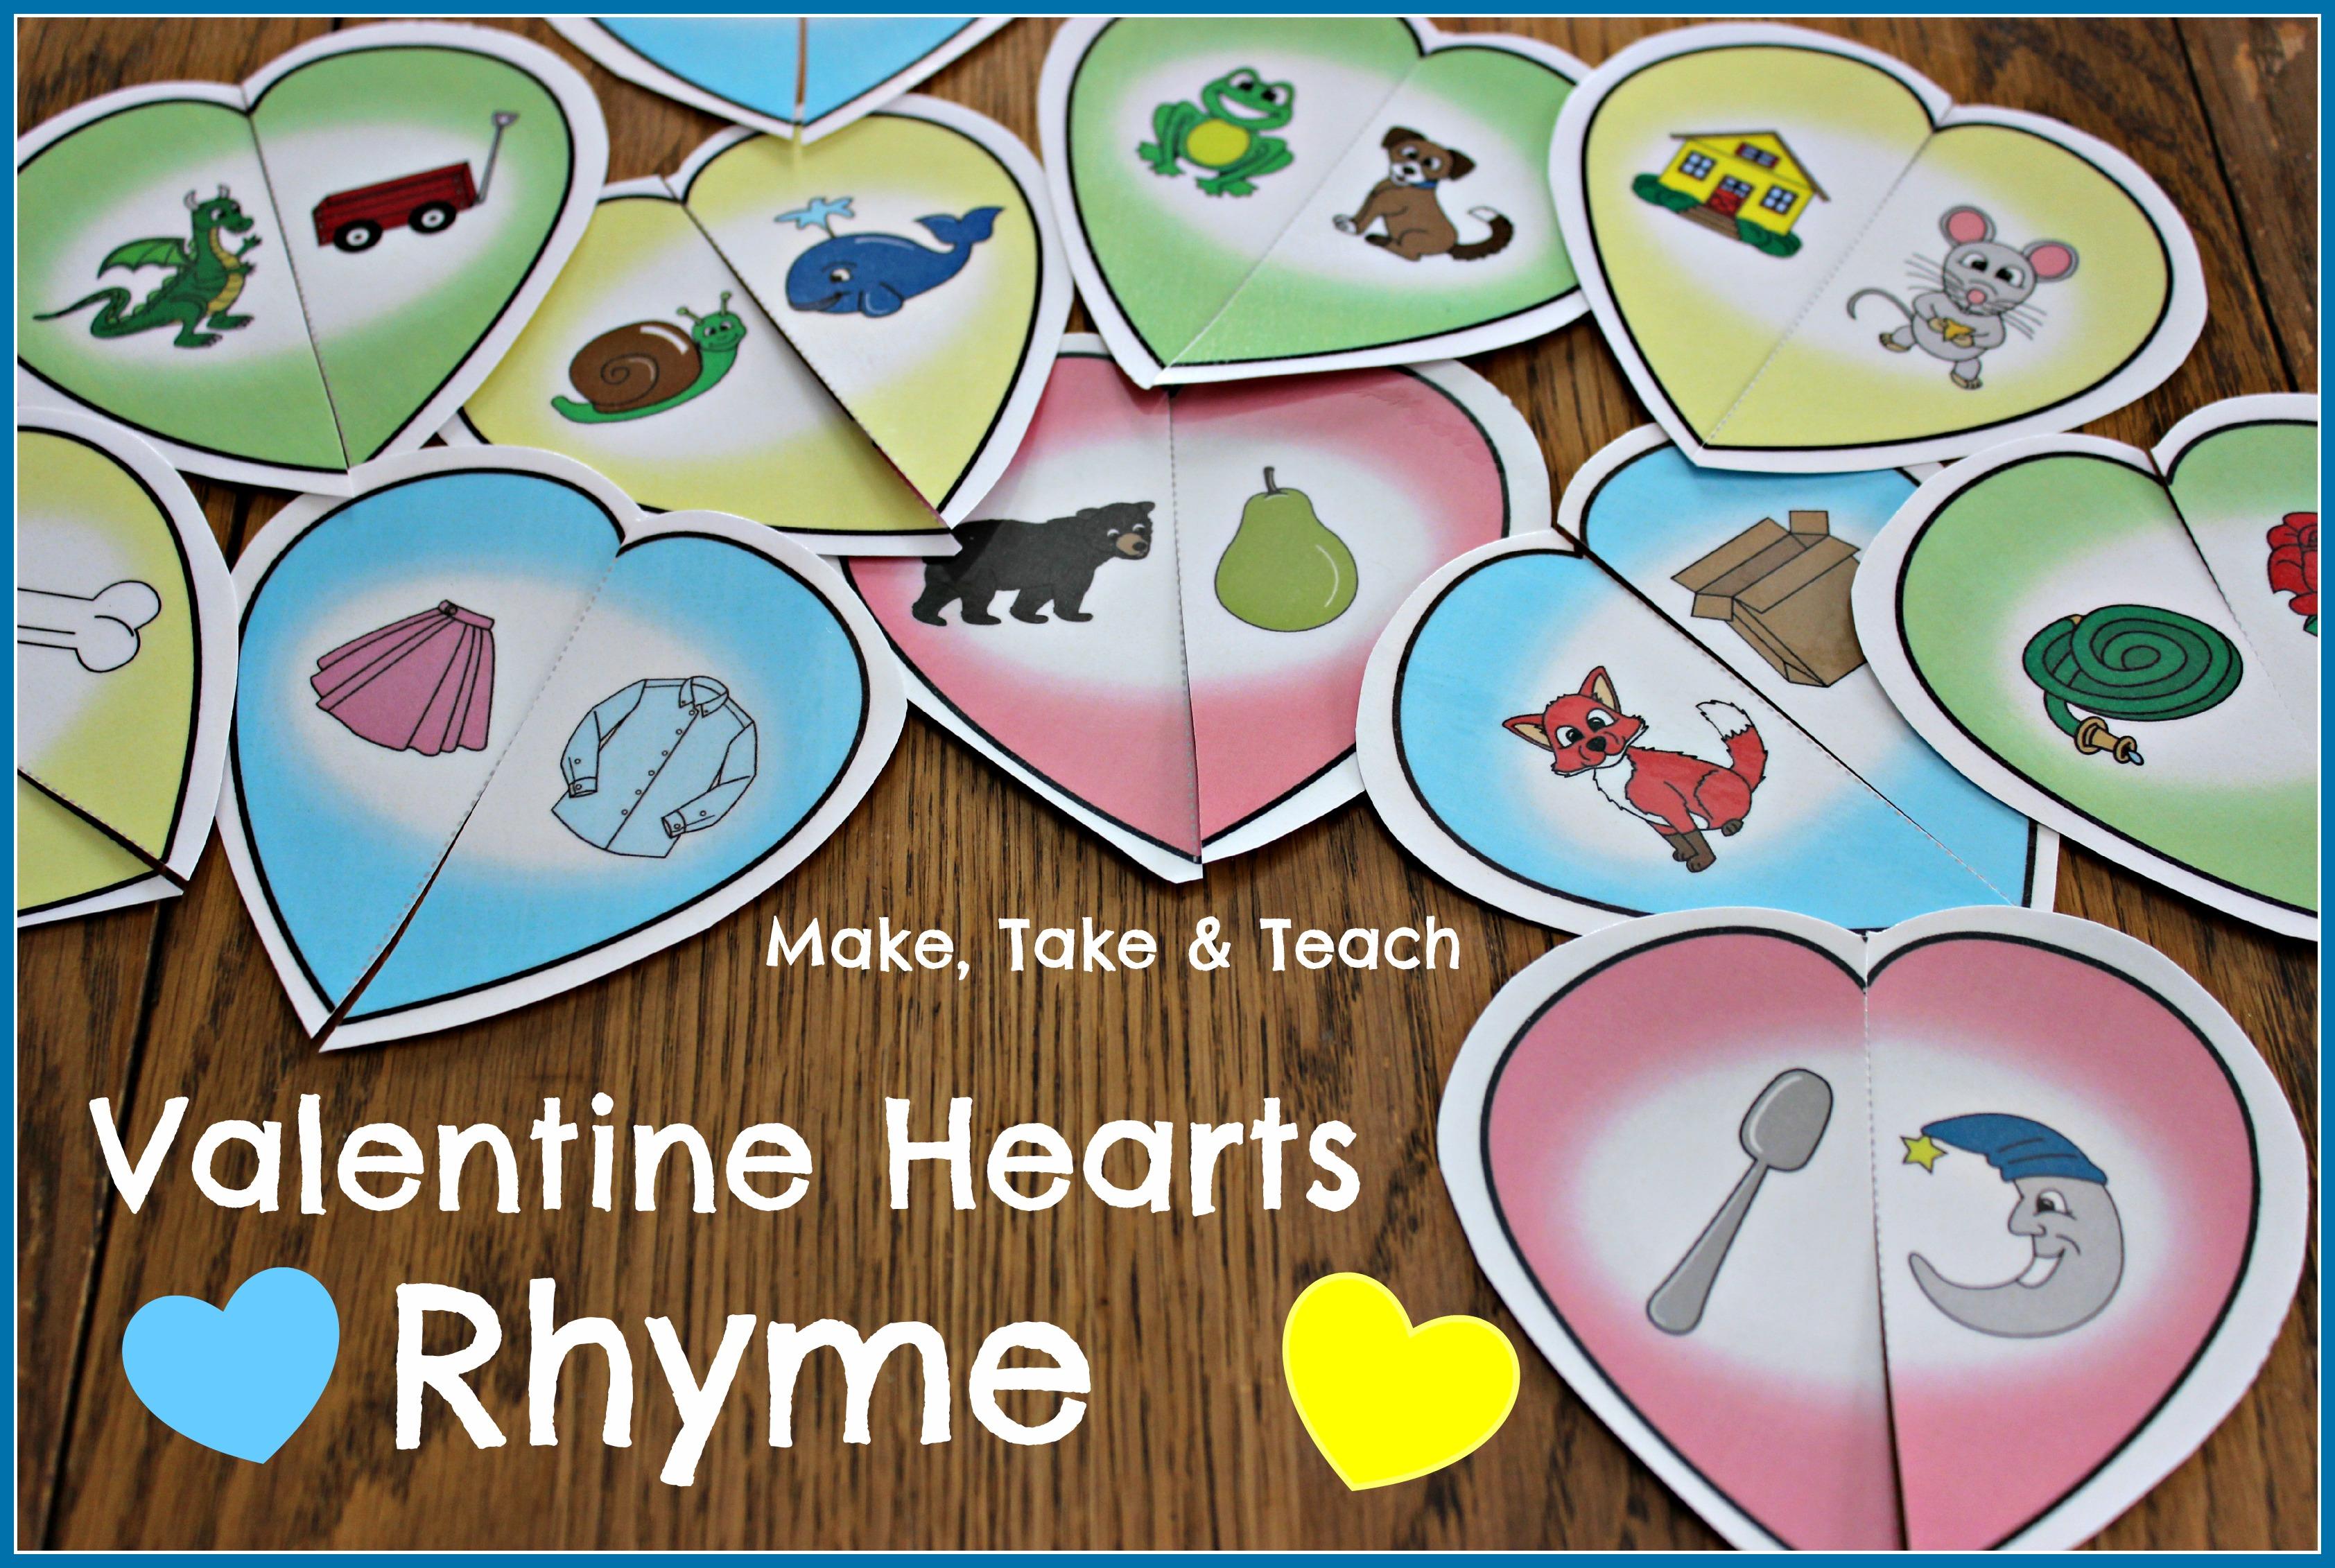 Valentinerhyme Copy